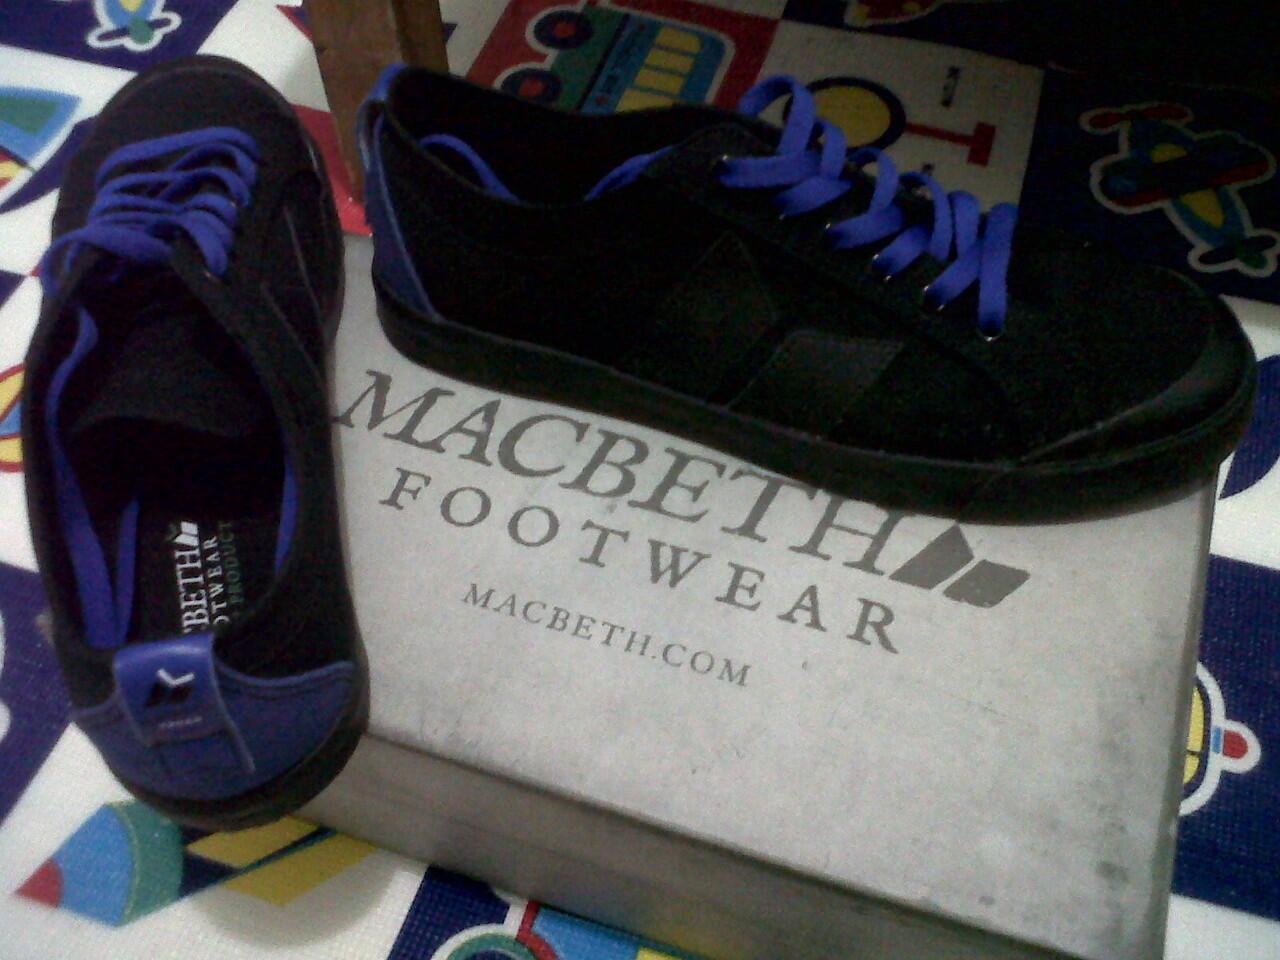 Hot SUMMER 2012 Macbeth Footwear Eliot Black (Garansi)